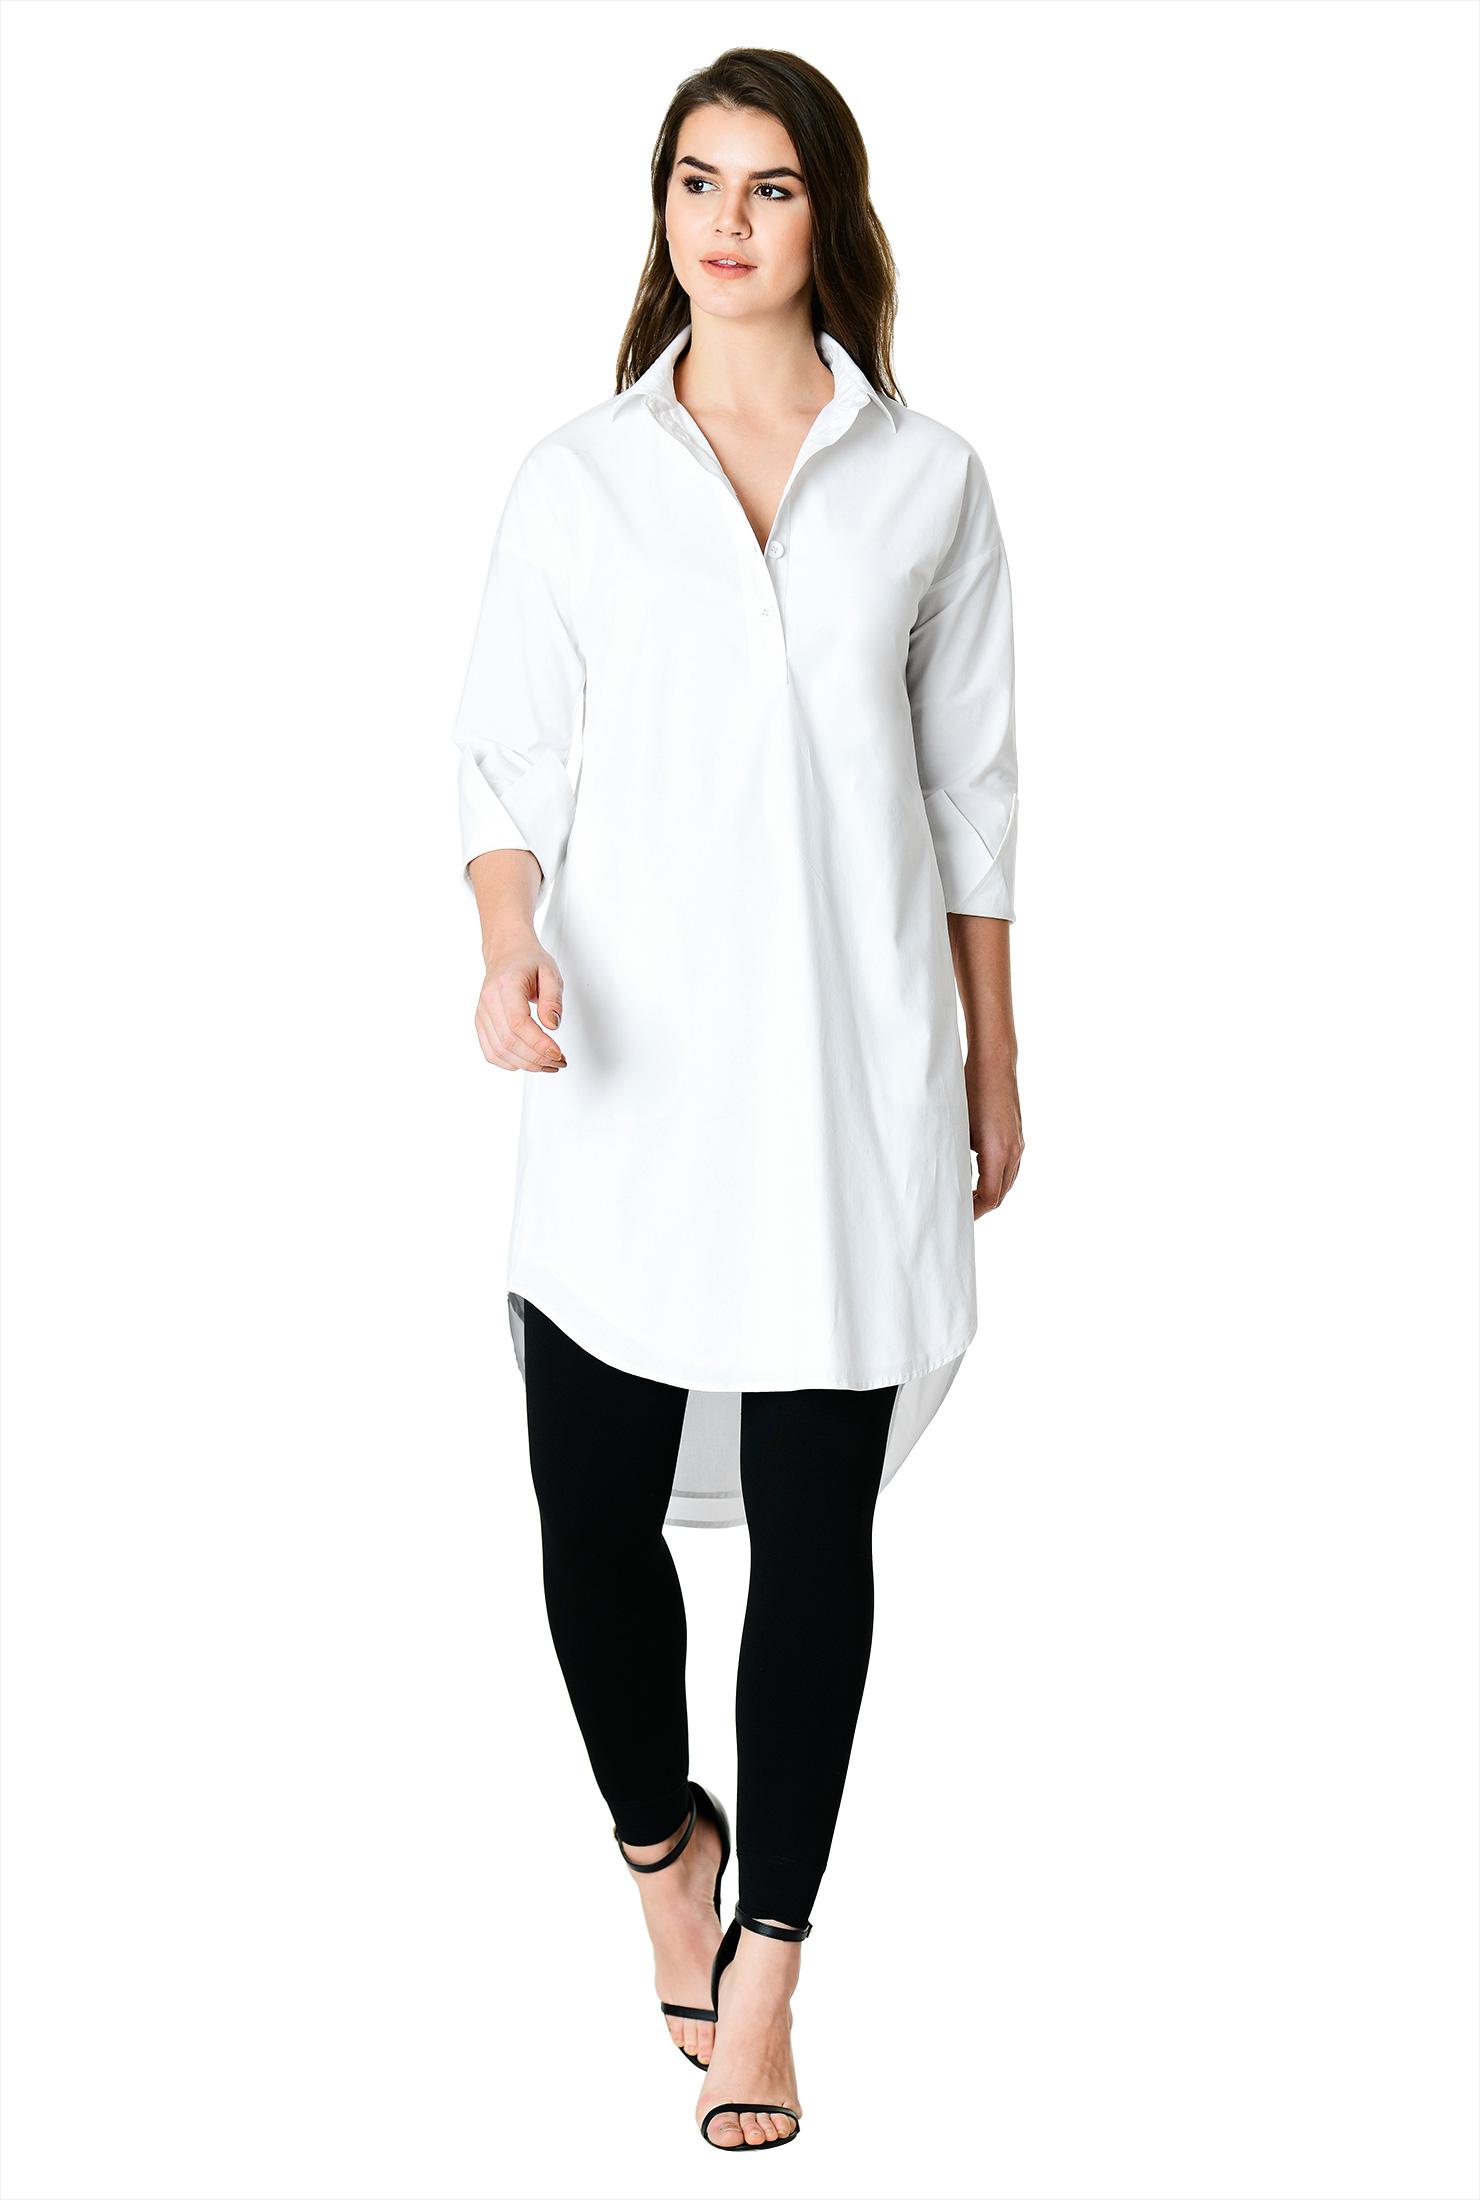 8e75e3f8b11ec0 Women s Fashion Clothing 0-36W and Custom